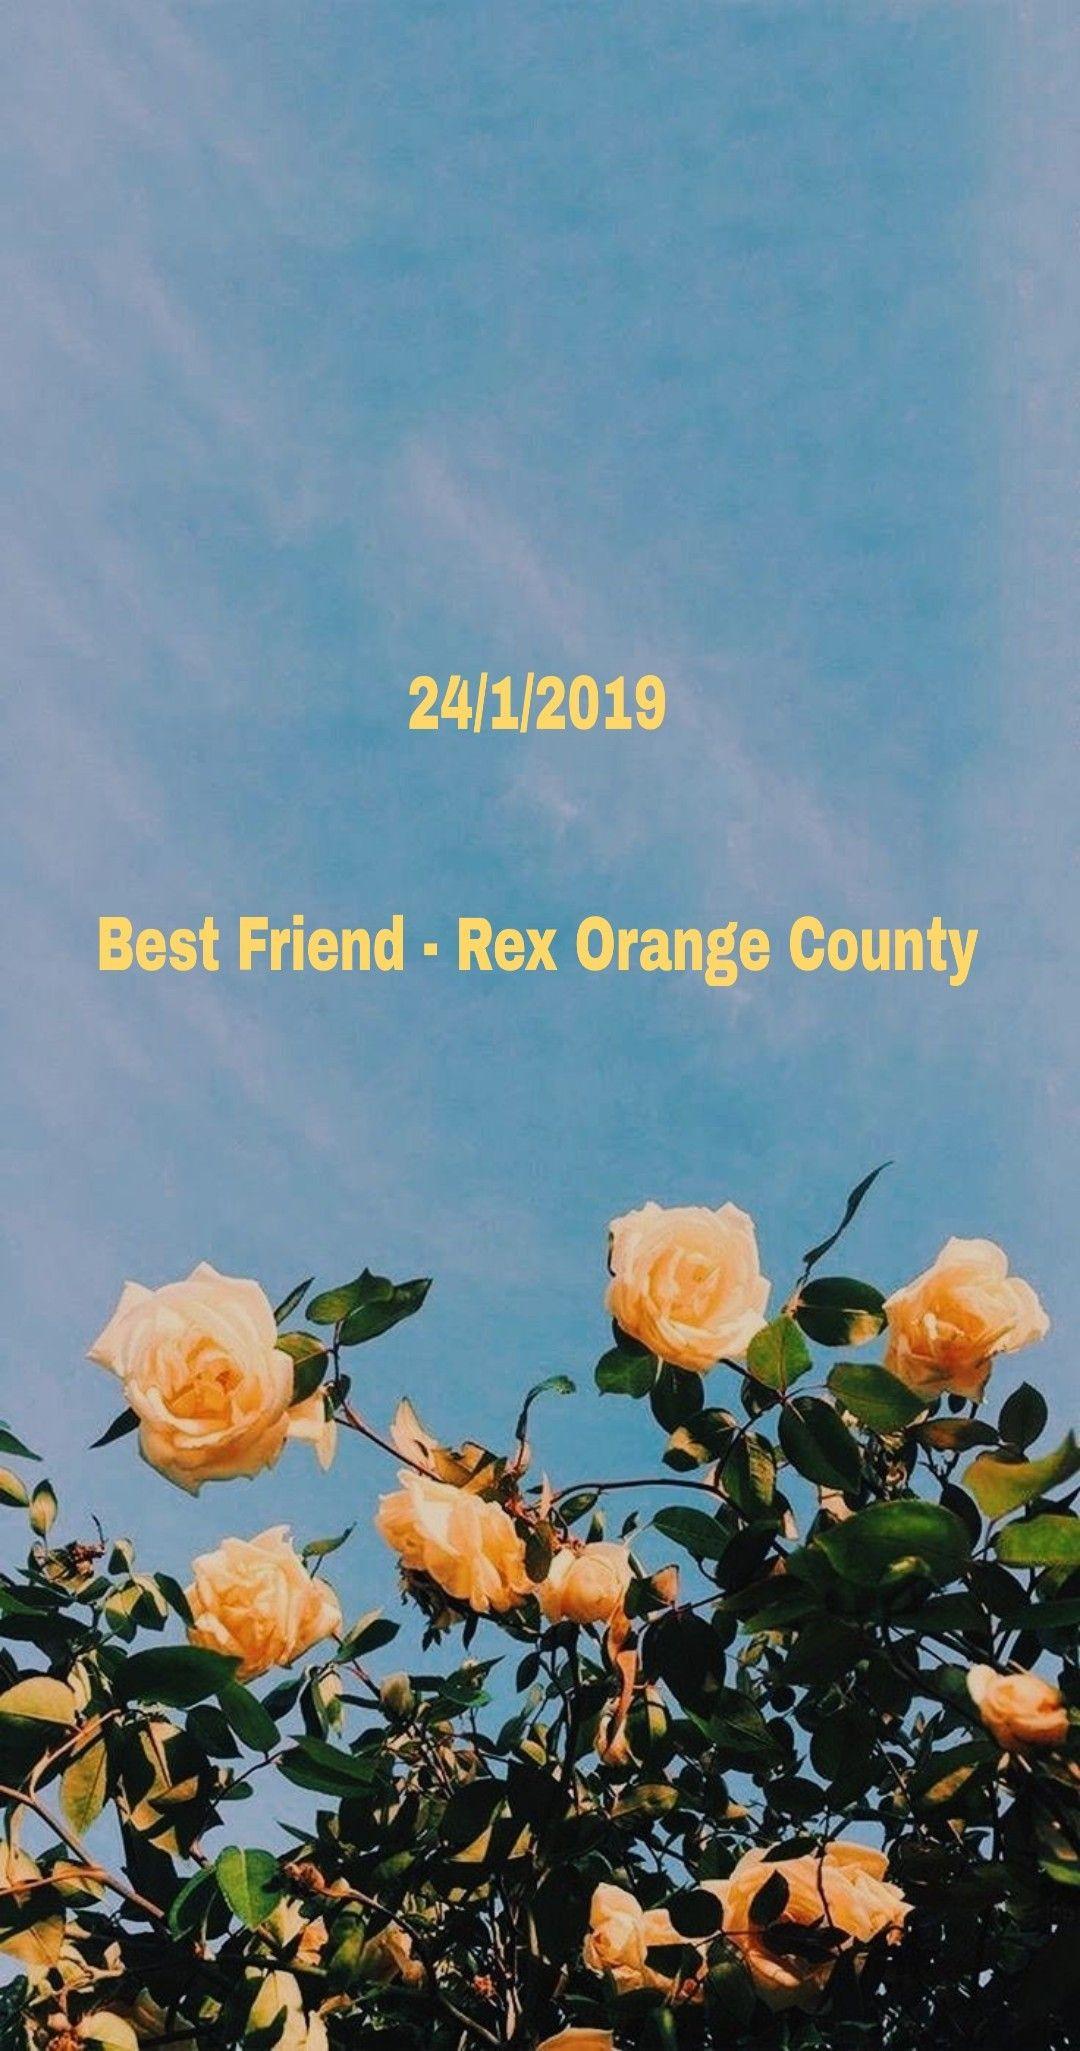 Rex Orange County Best Friend Wallpaper Shawn Mendes Lyrics Wallpaper Shawn Mendes Lyrics Rex Orange County Coolest wallpaper flower with quotes